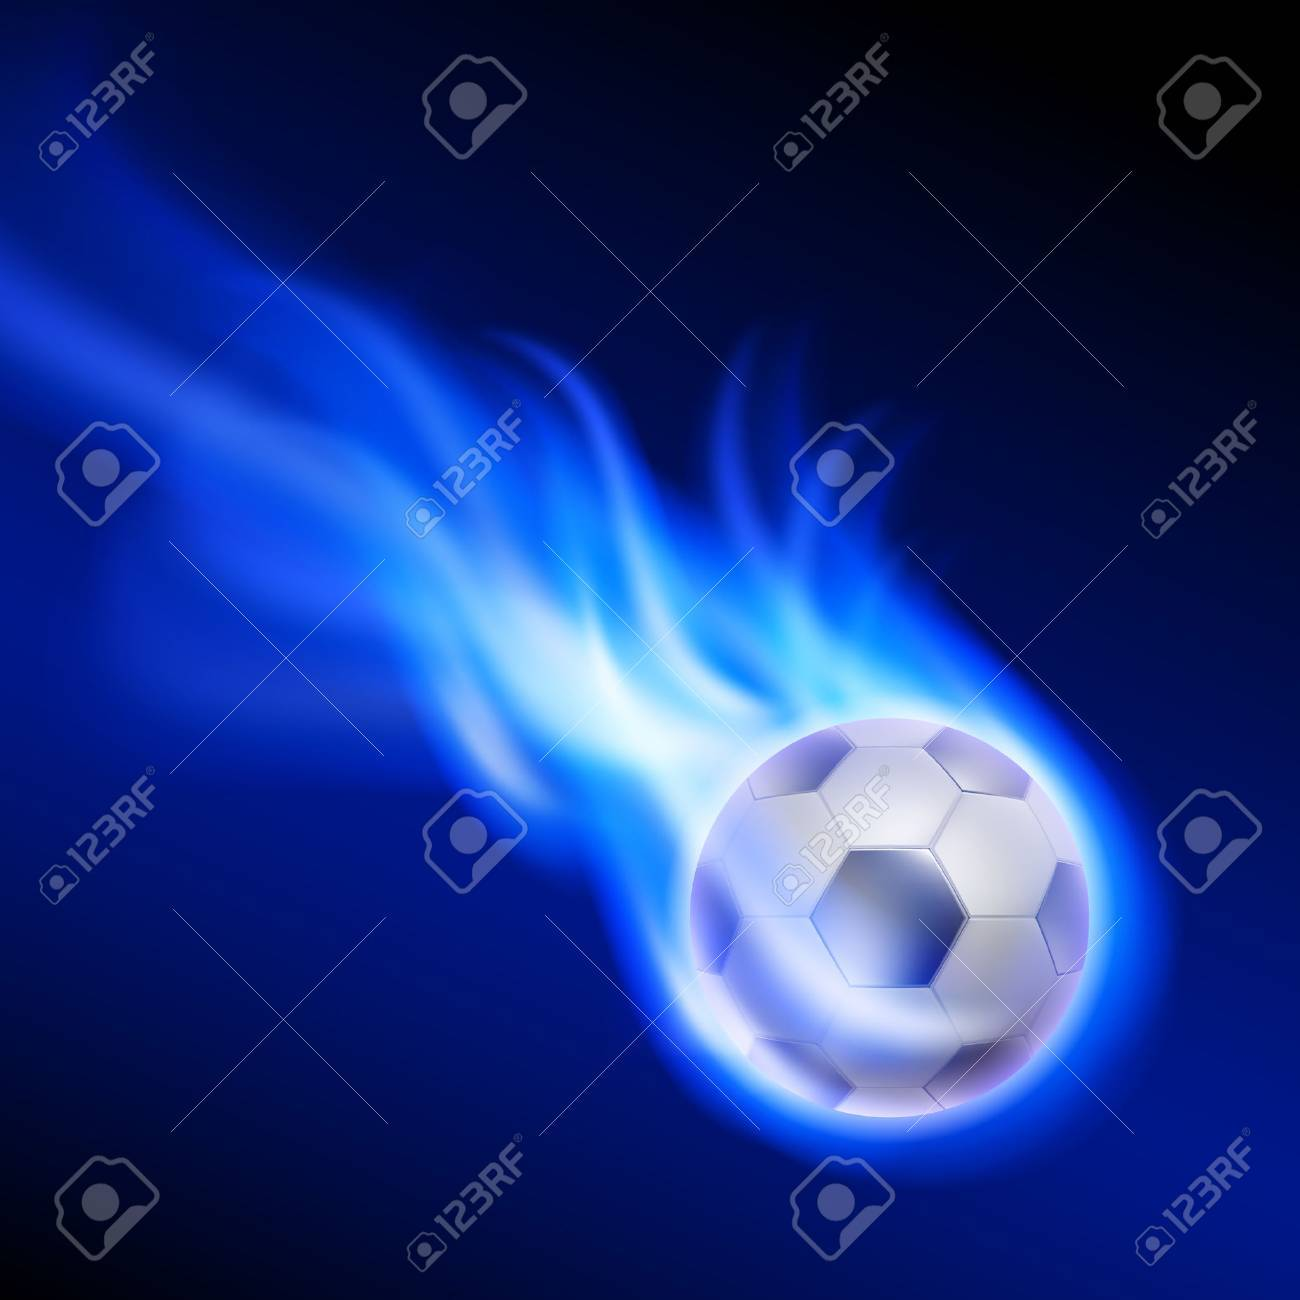 Burning football on blue fire. EPS10 vector. - 38858691